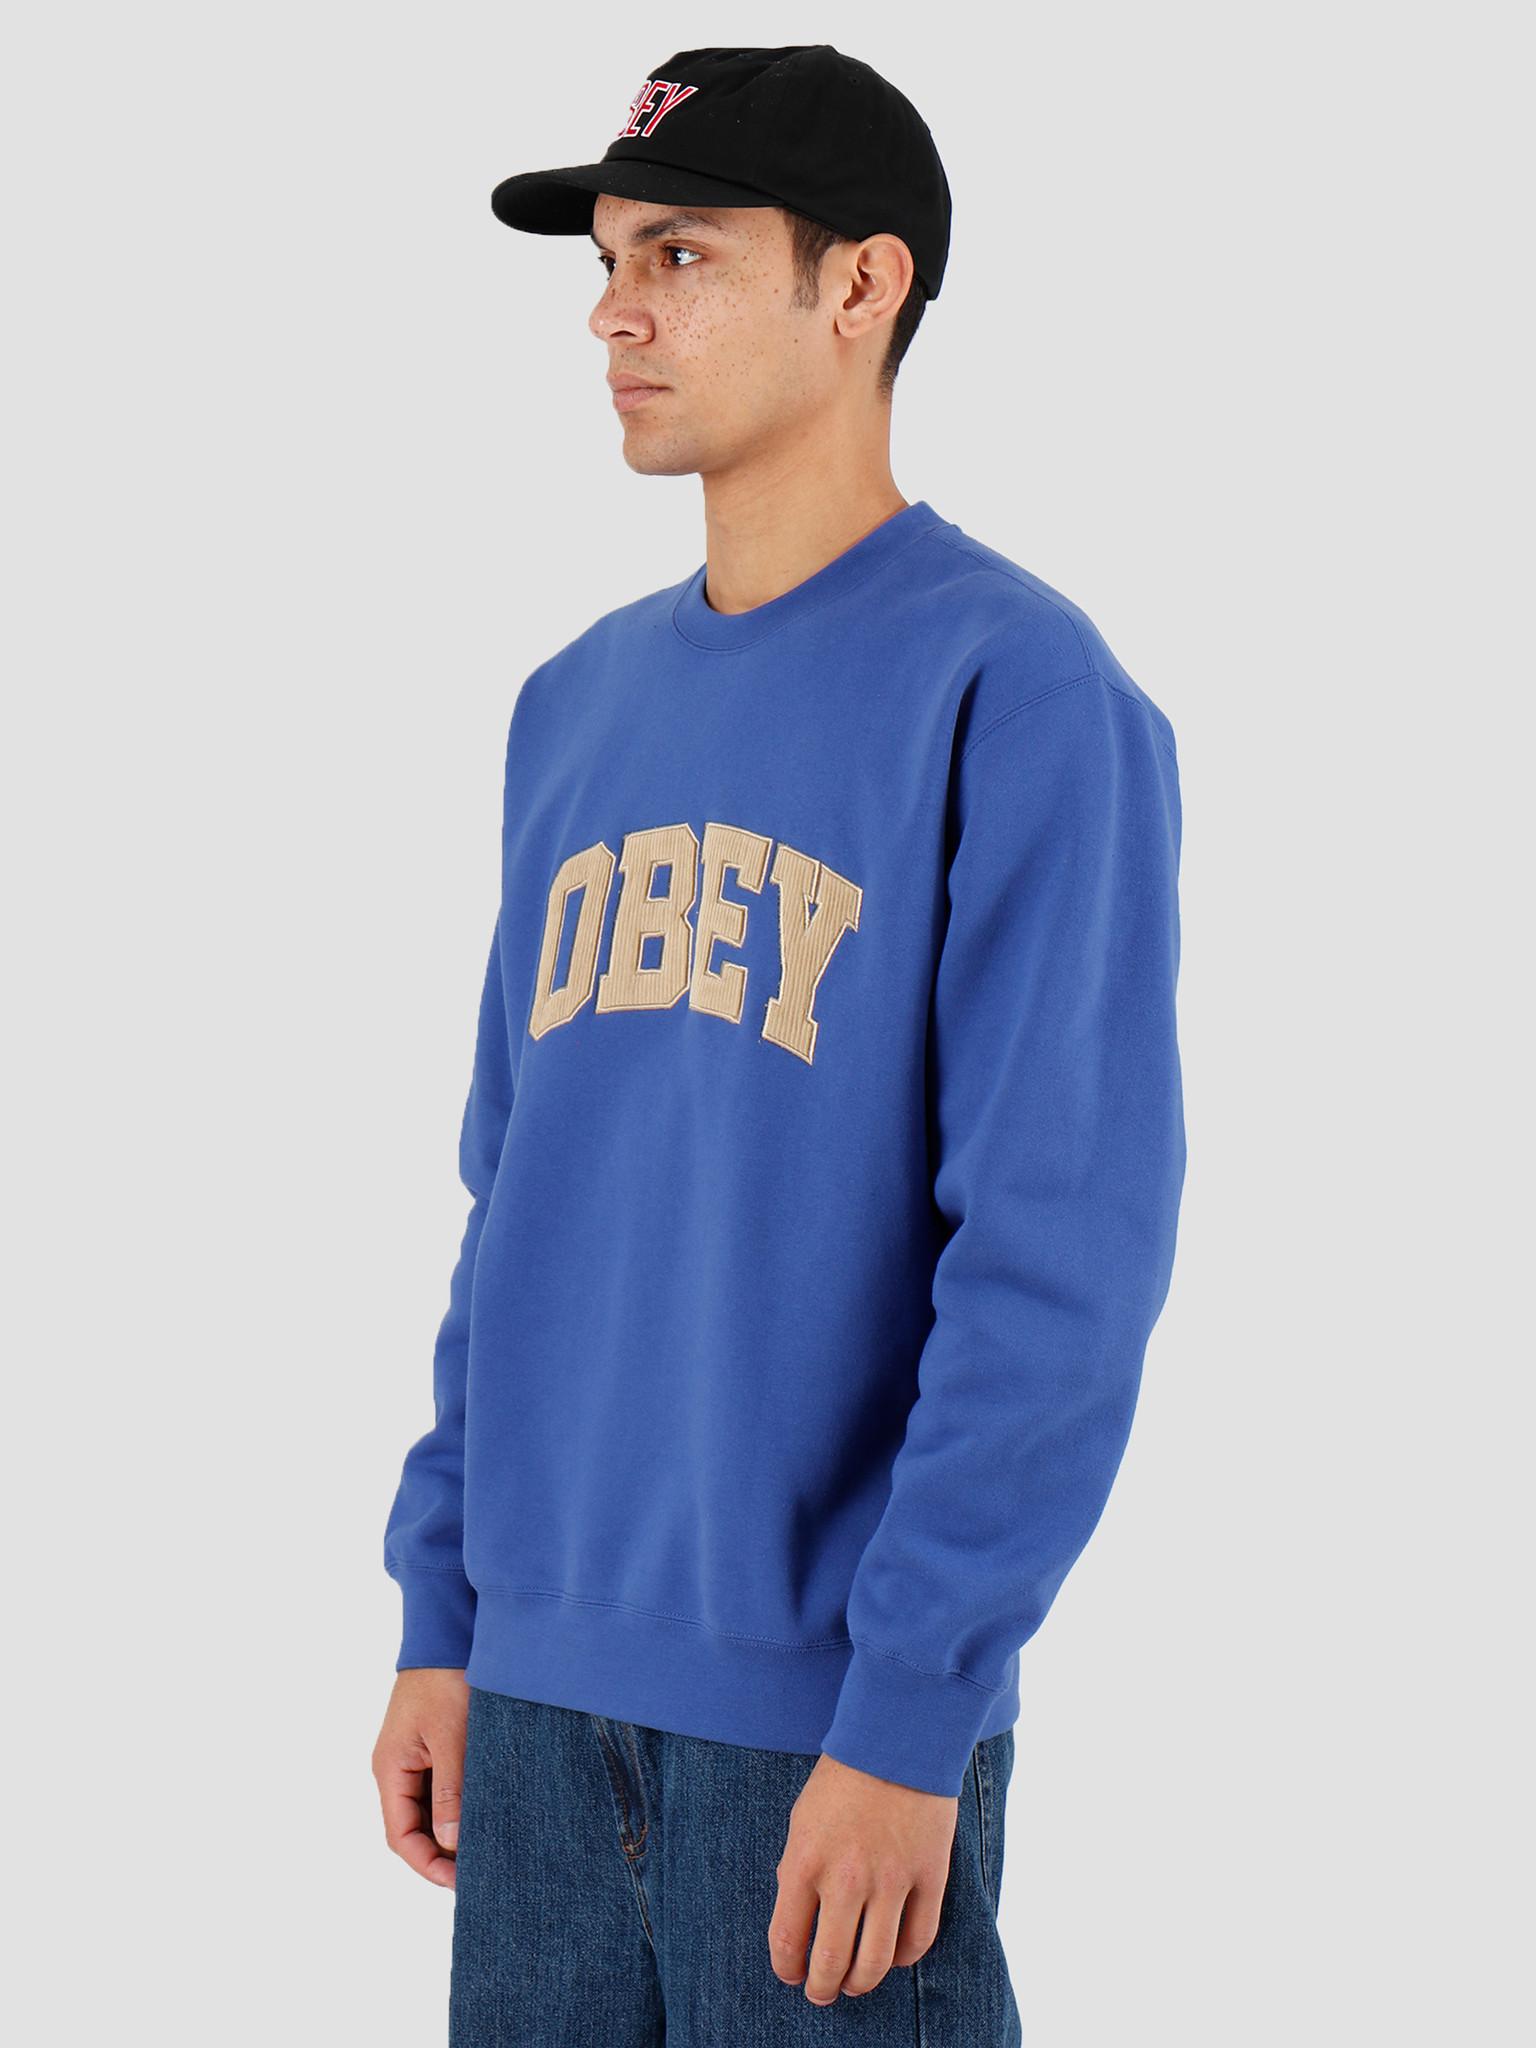 Obey Obey OBEY Uni Crew Blue 112480066BLU